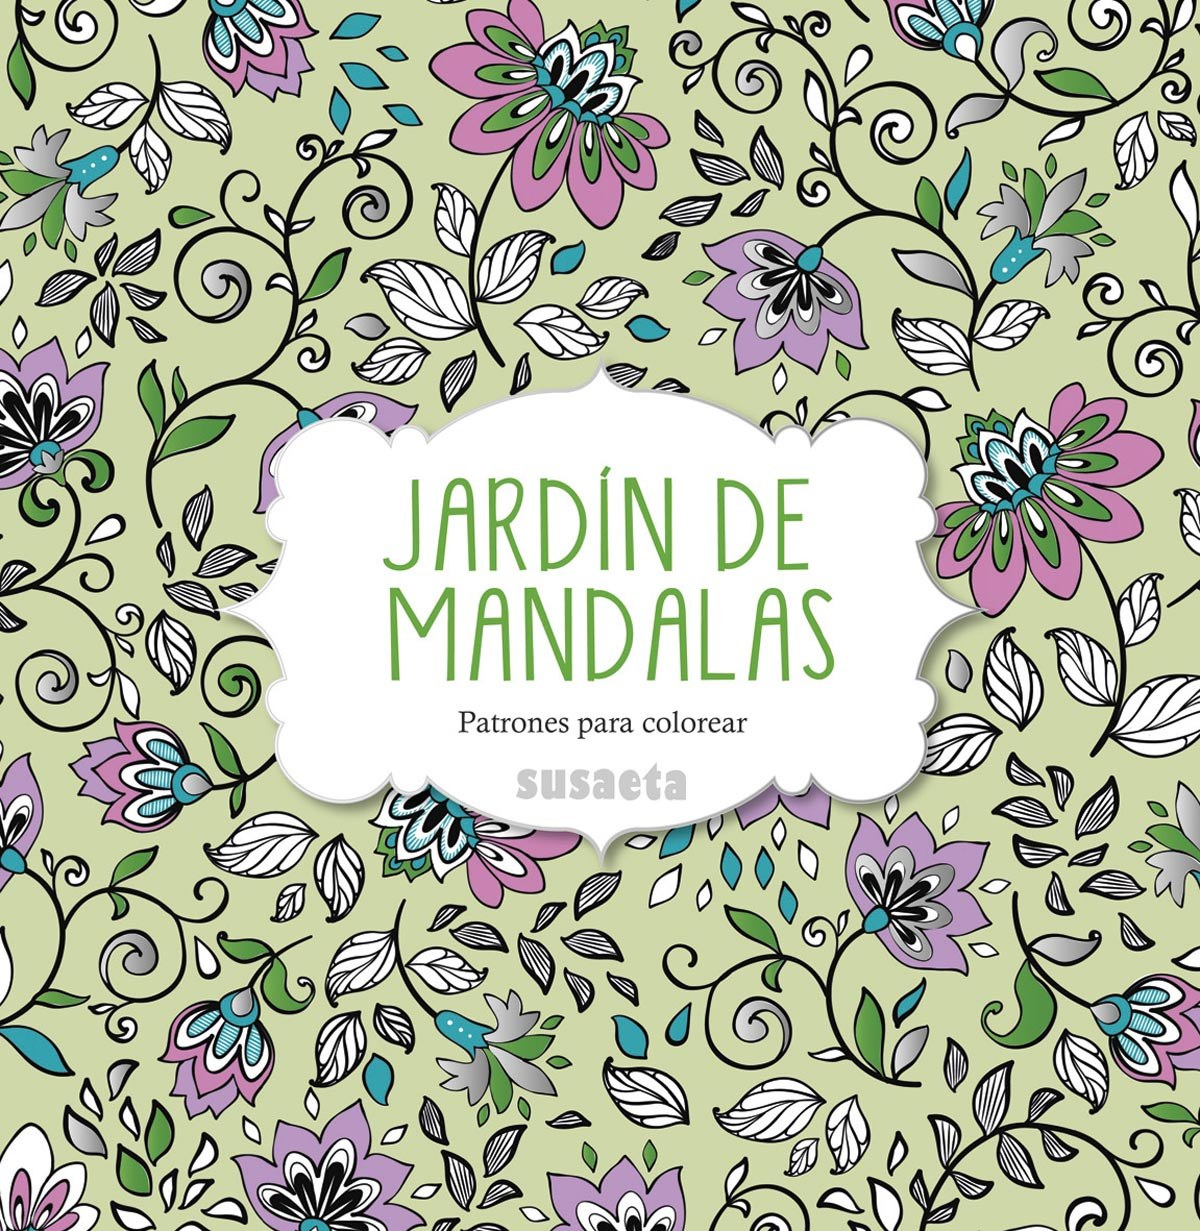 Jardines de mandalas 9788467742930